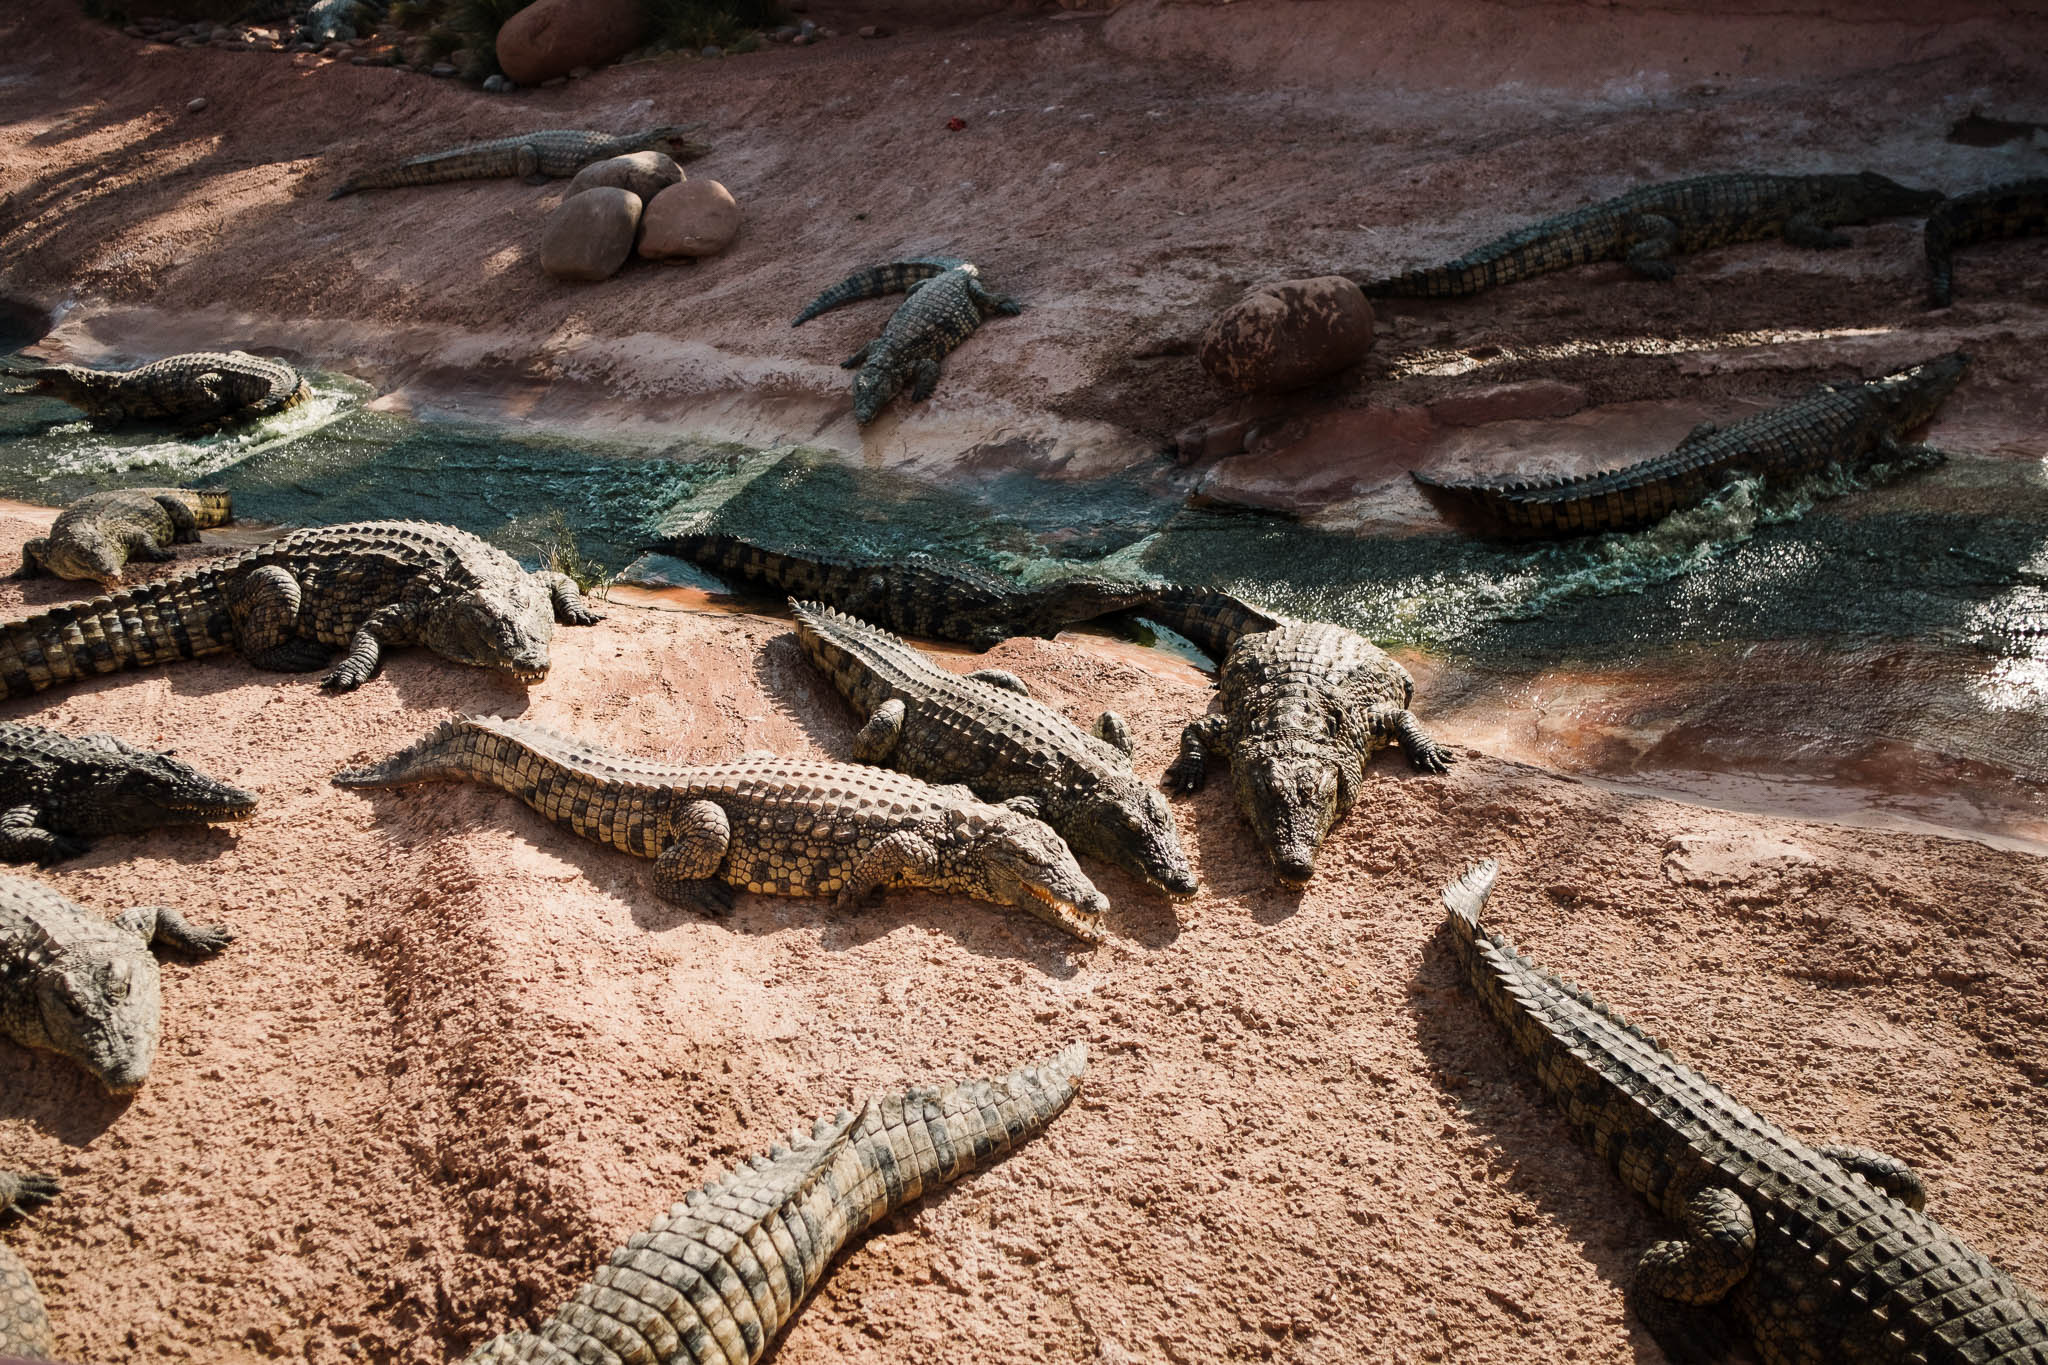 crocs sunbathing